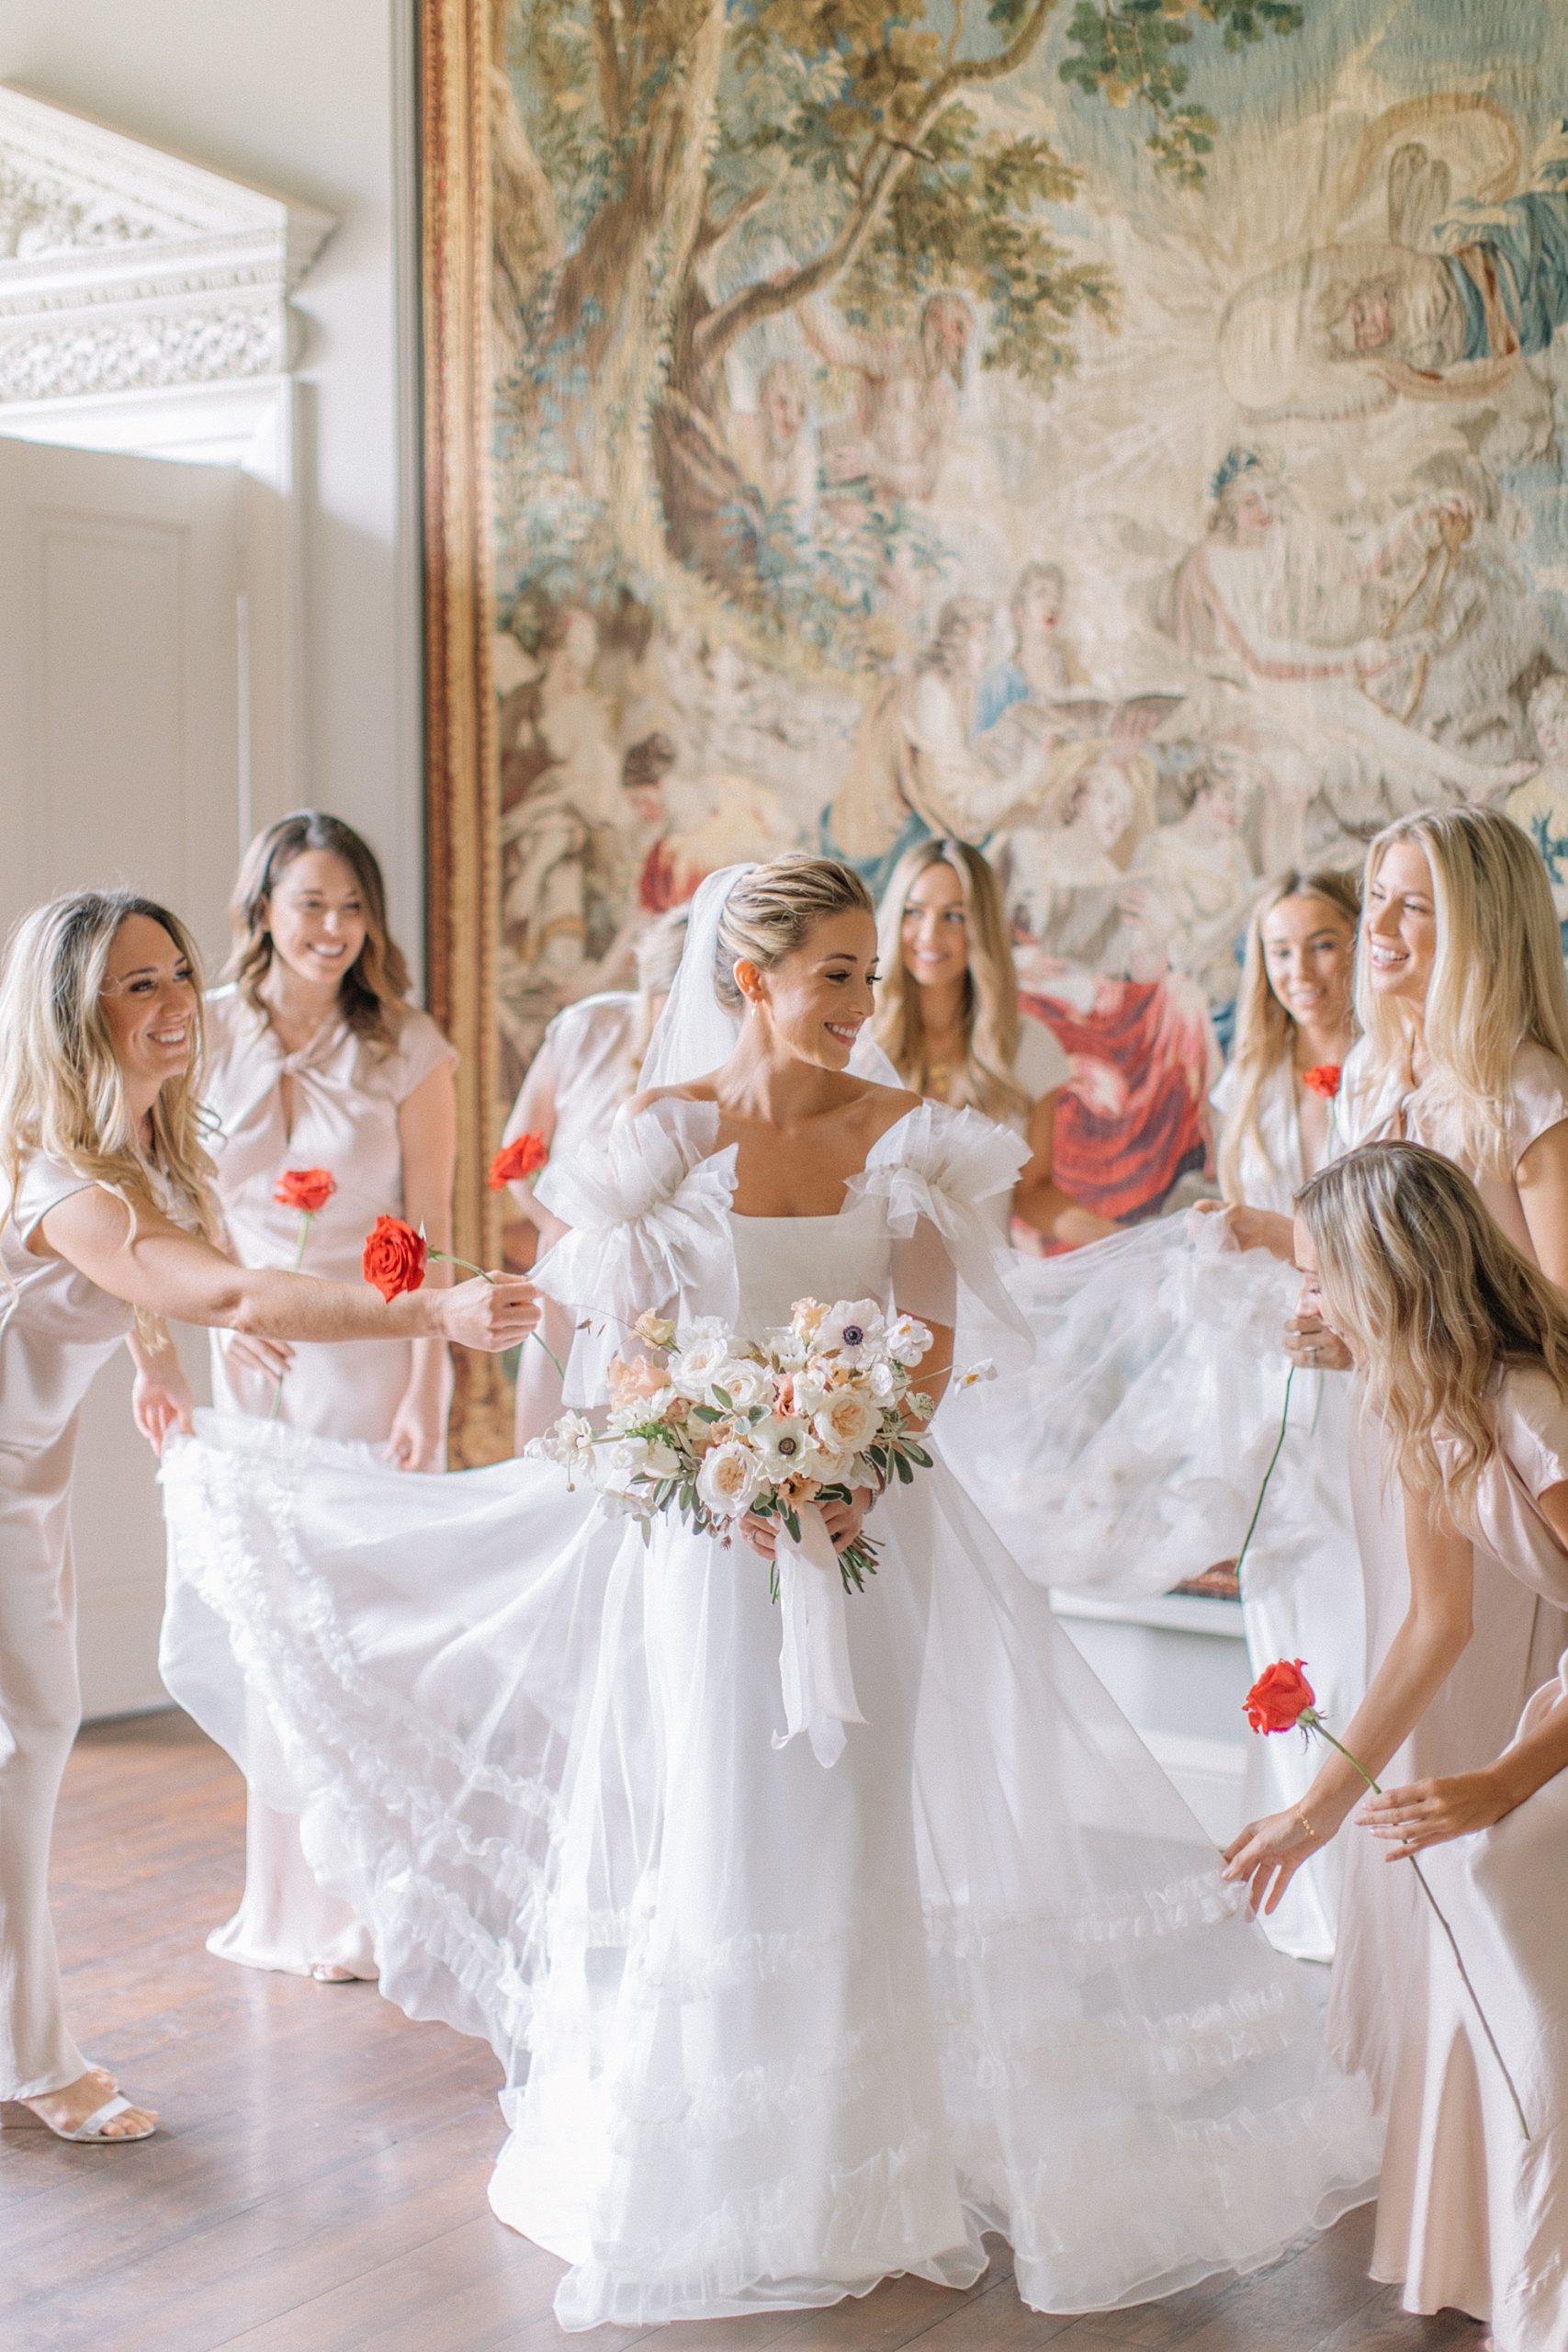 St Giles House Wedding - bridal Portraits